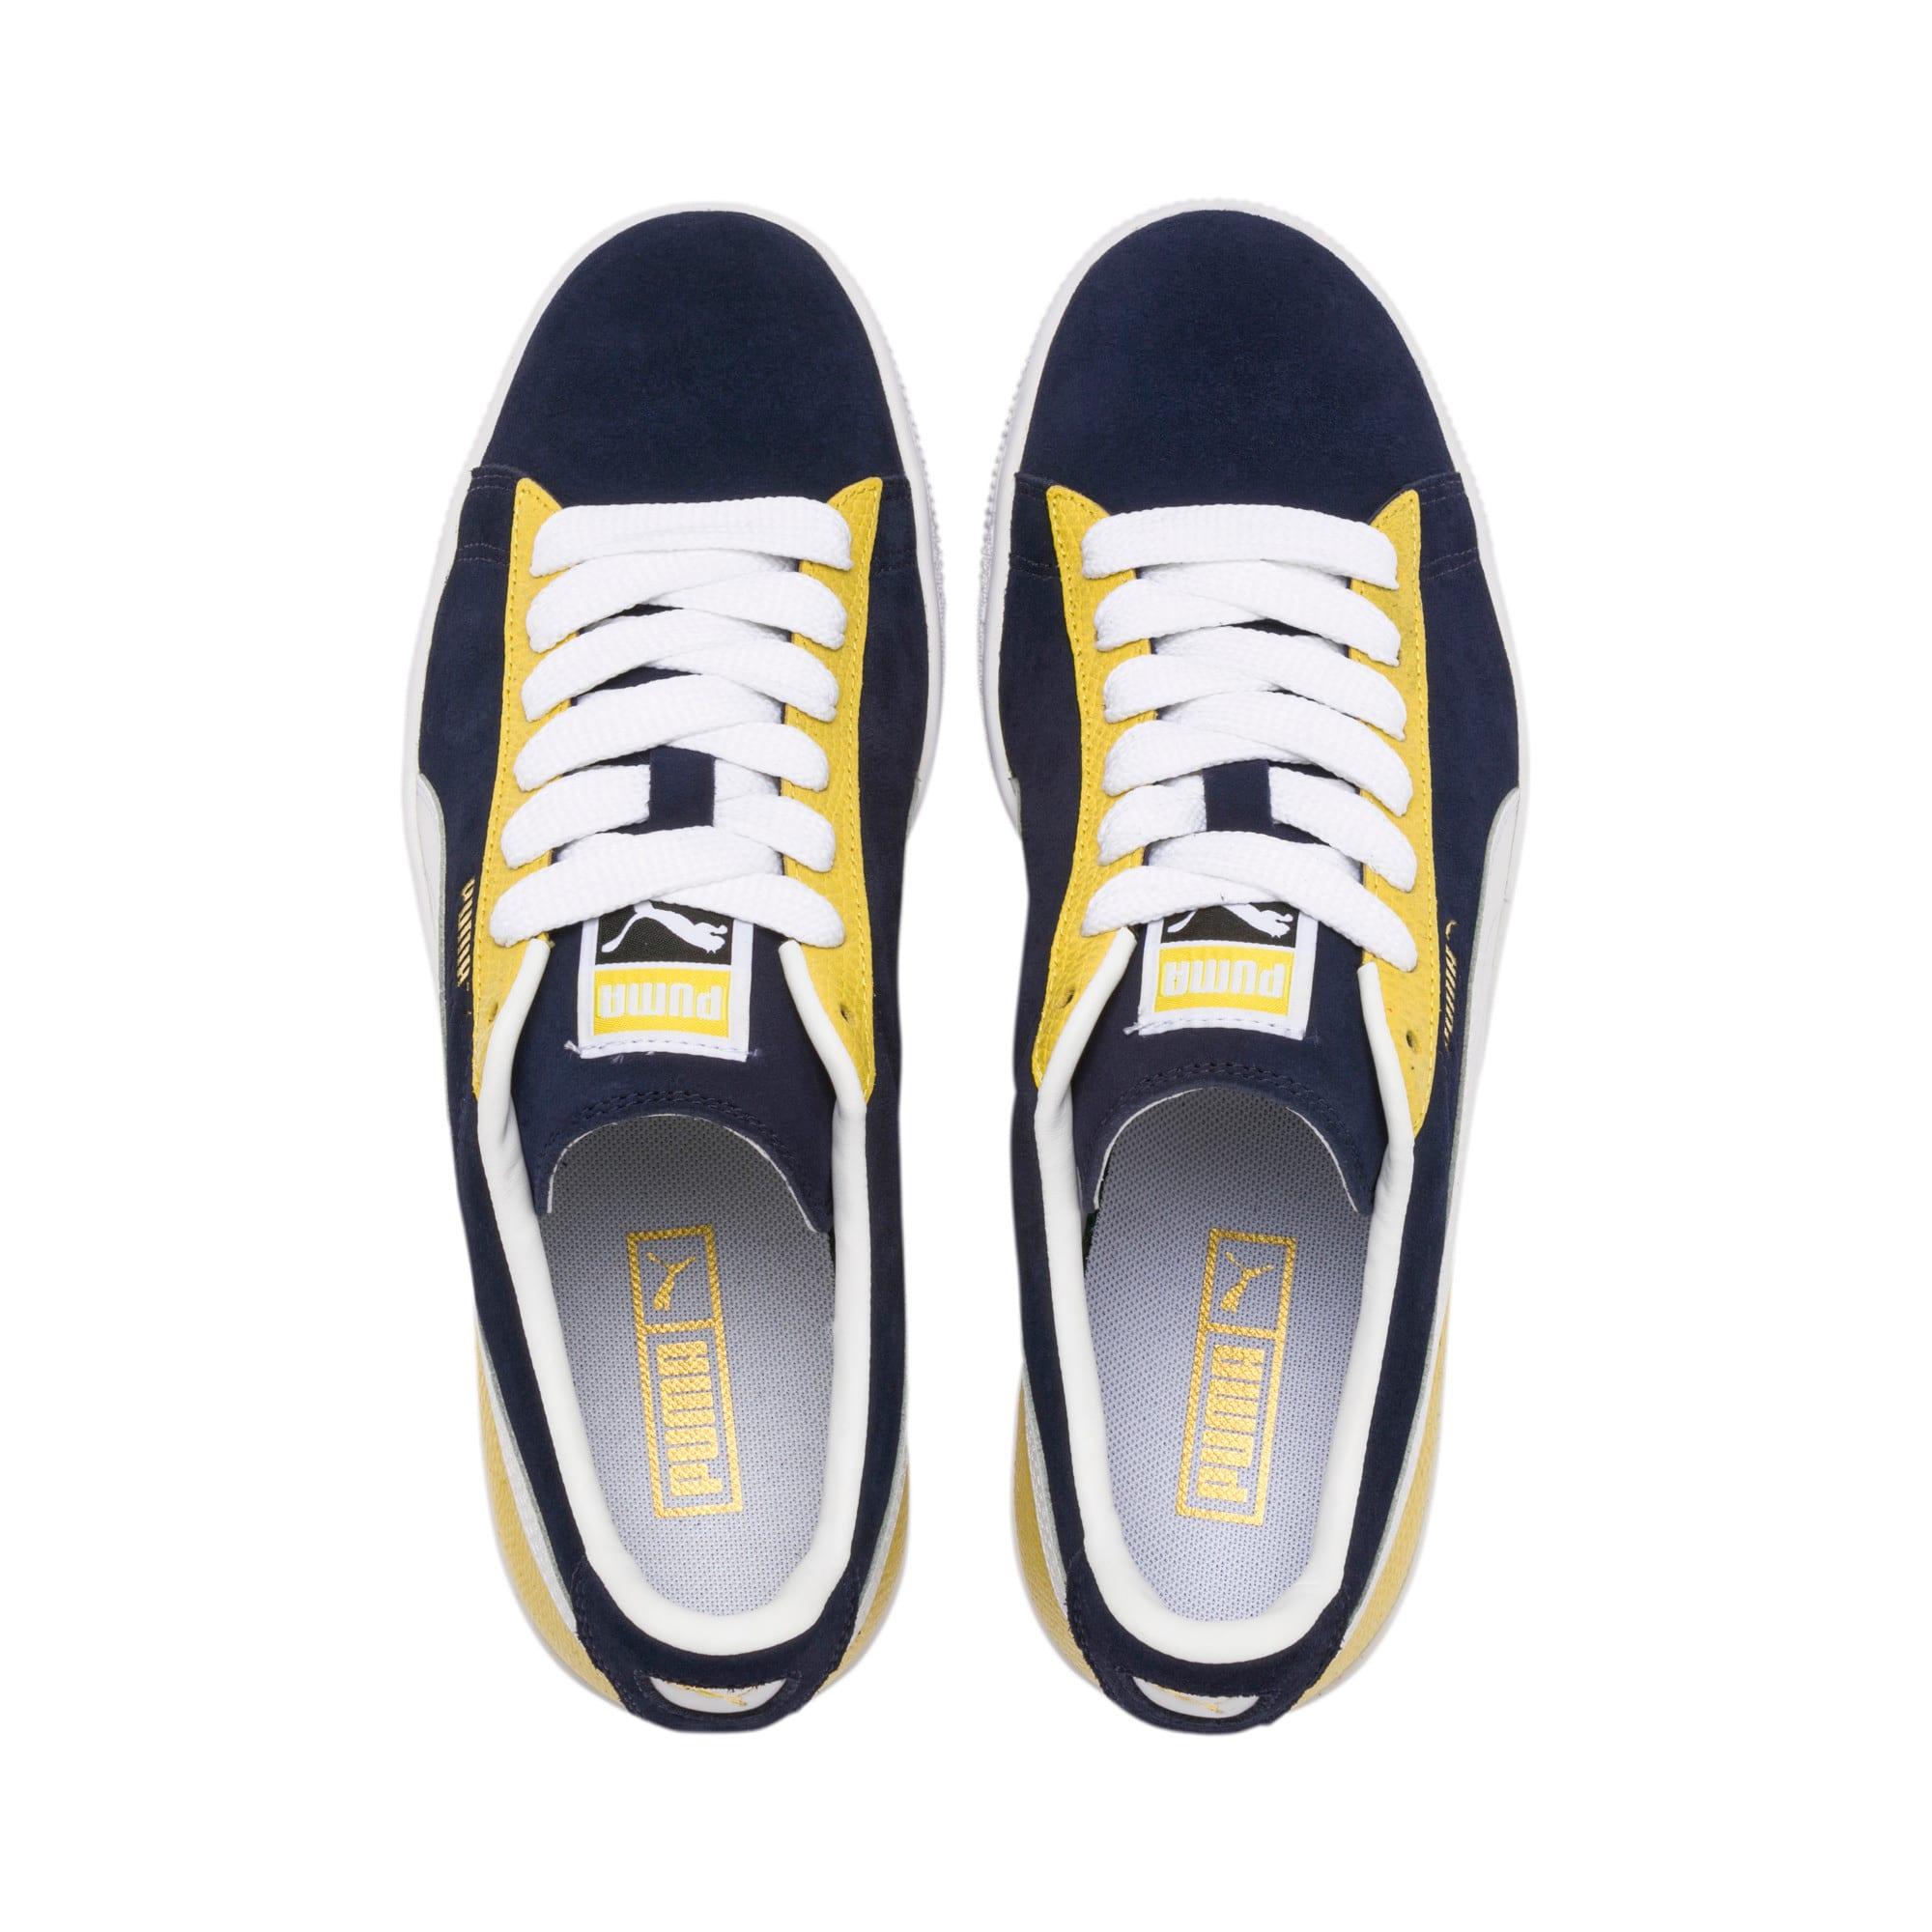 Thumbnail 7 of Suede Classic Block Sneakers, Peacoat-Sulphur-Puma White, medium